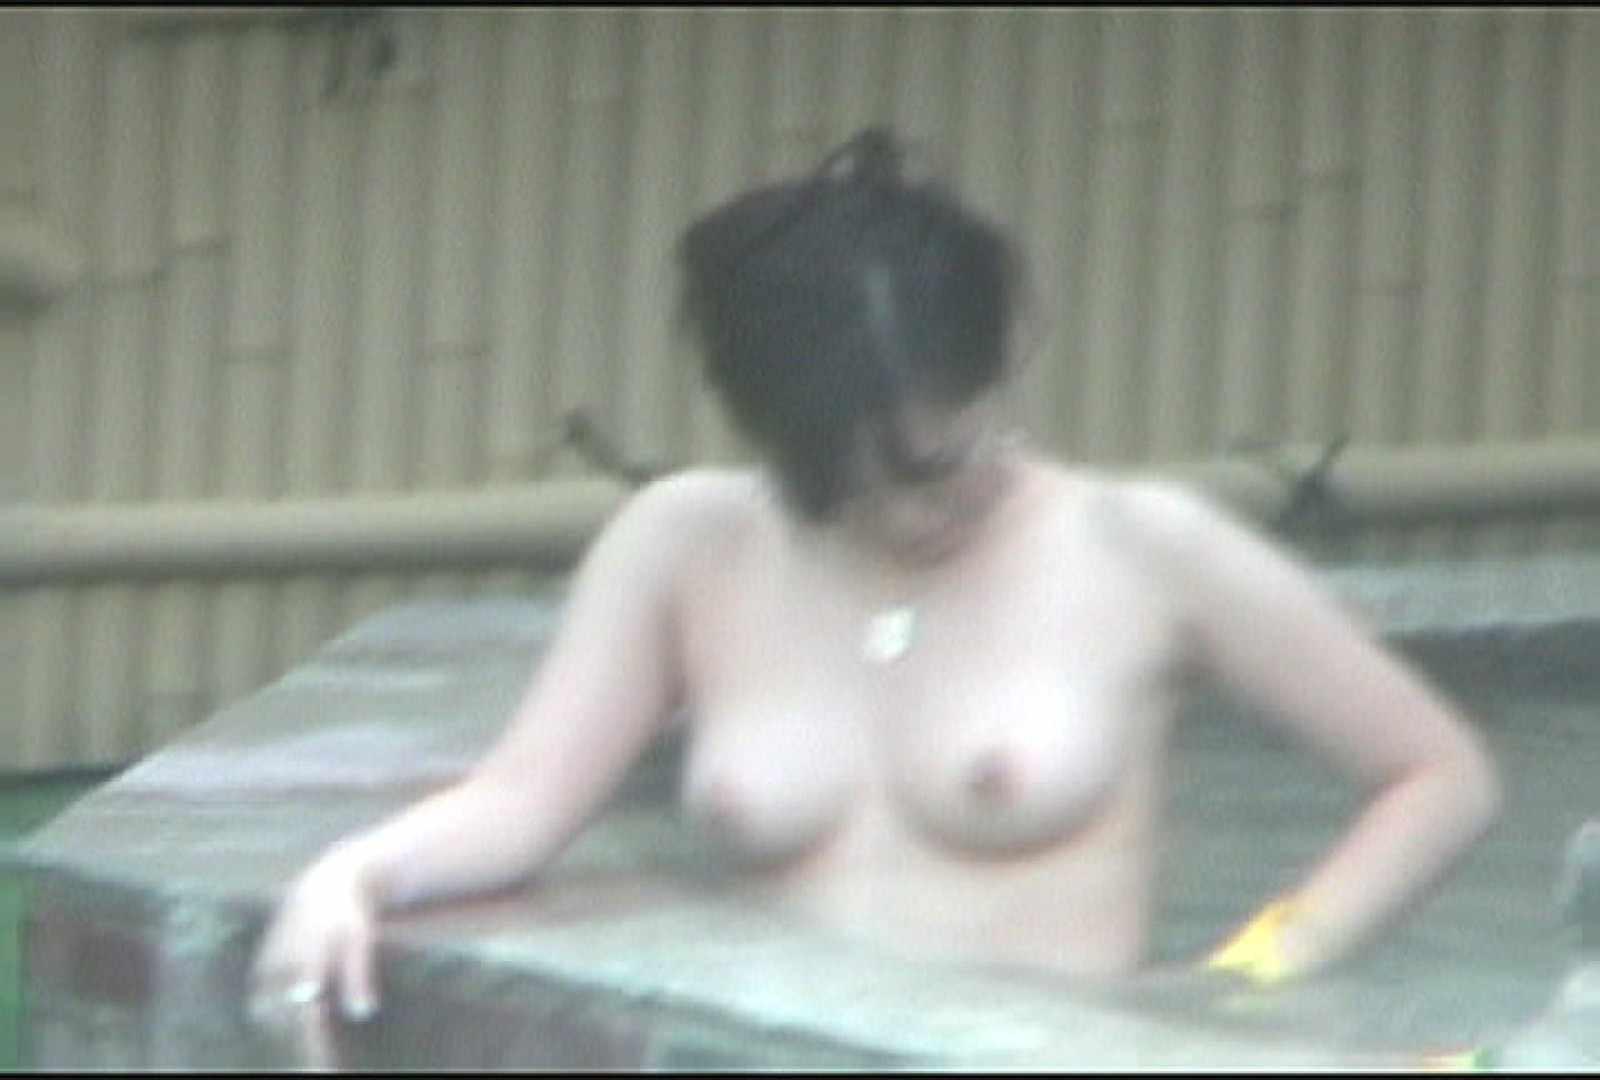 Aquaな露天風呂Vol.145 盗撮映像  78Pix 65